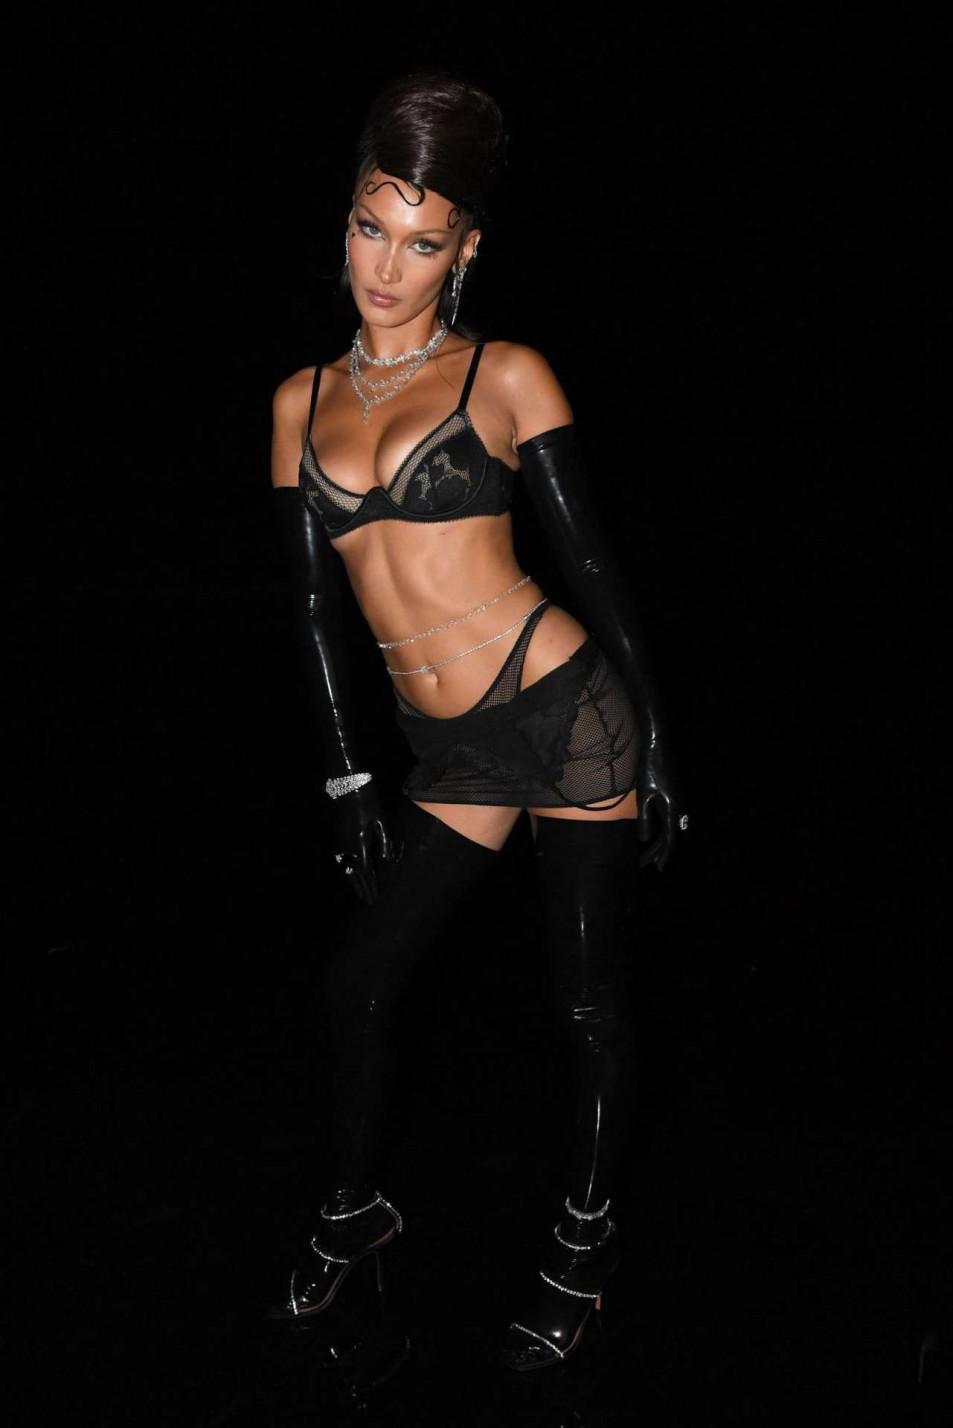 Bella-Hadid-in-Rihannas-Savage-X-Fenty-Show-7.jpg